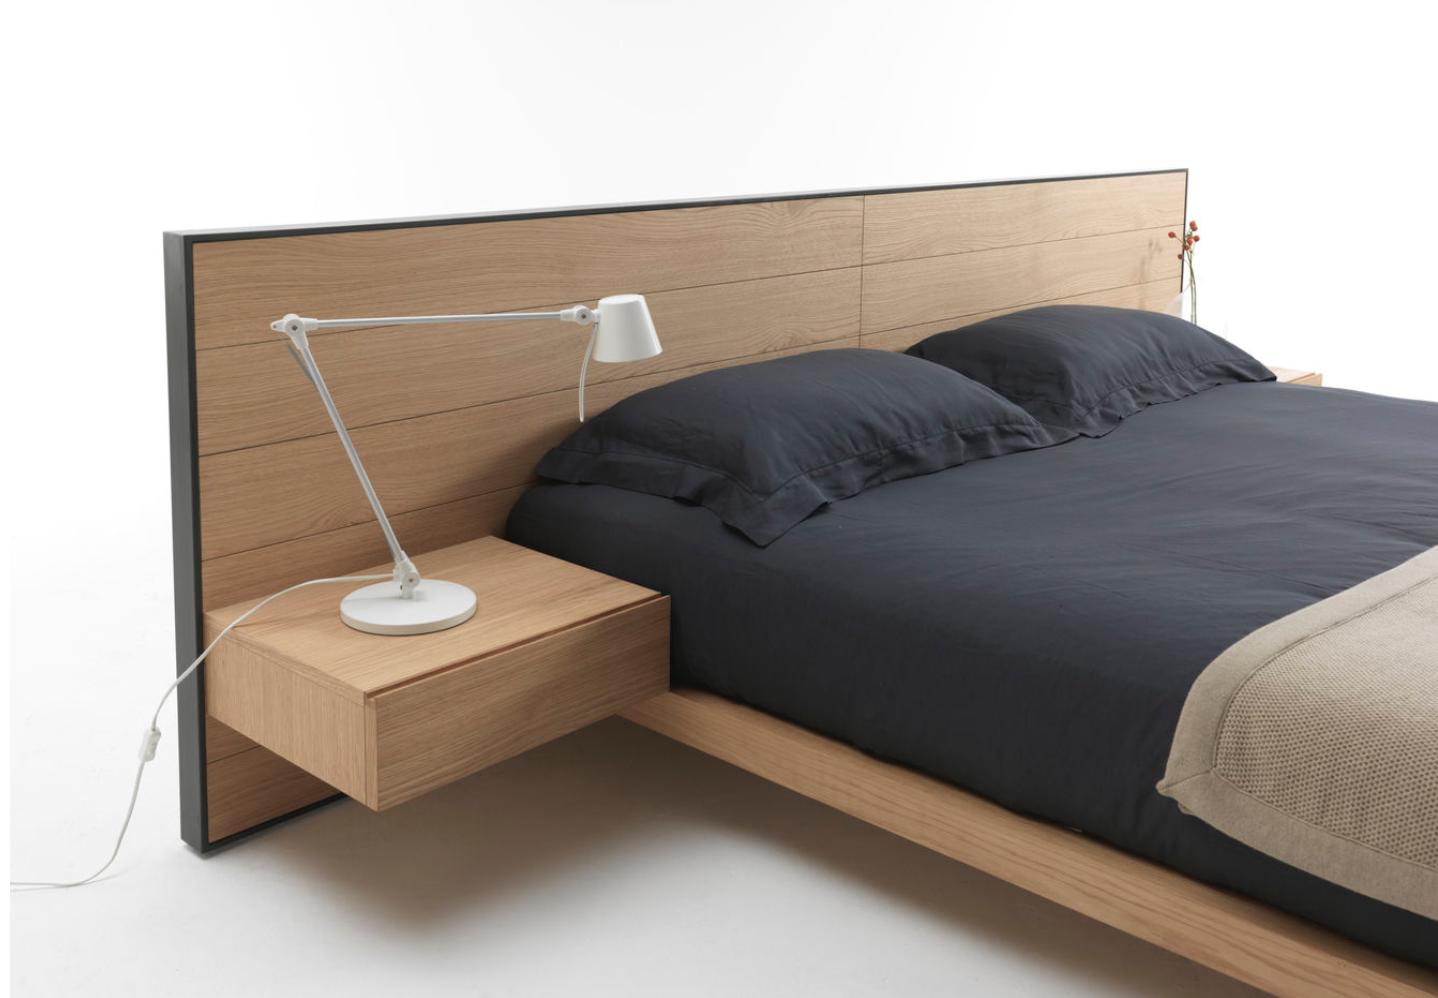 Riva1920_Rialto bed1.png